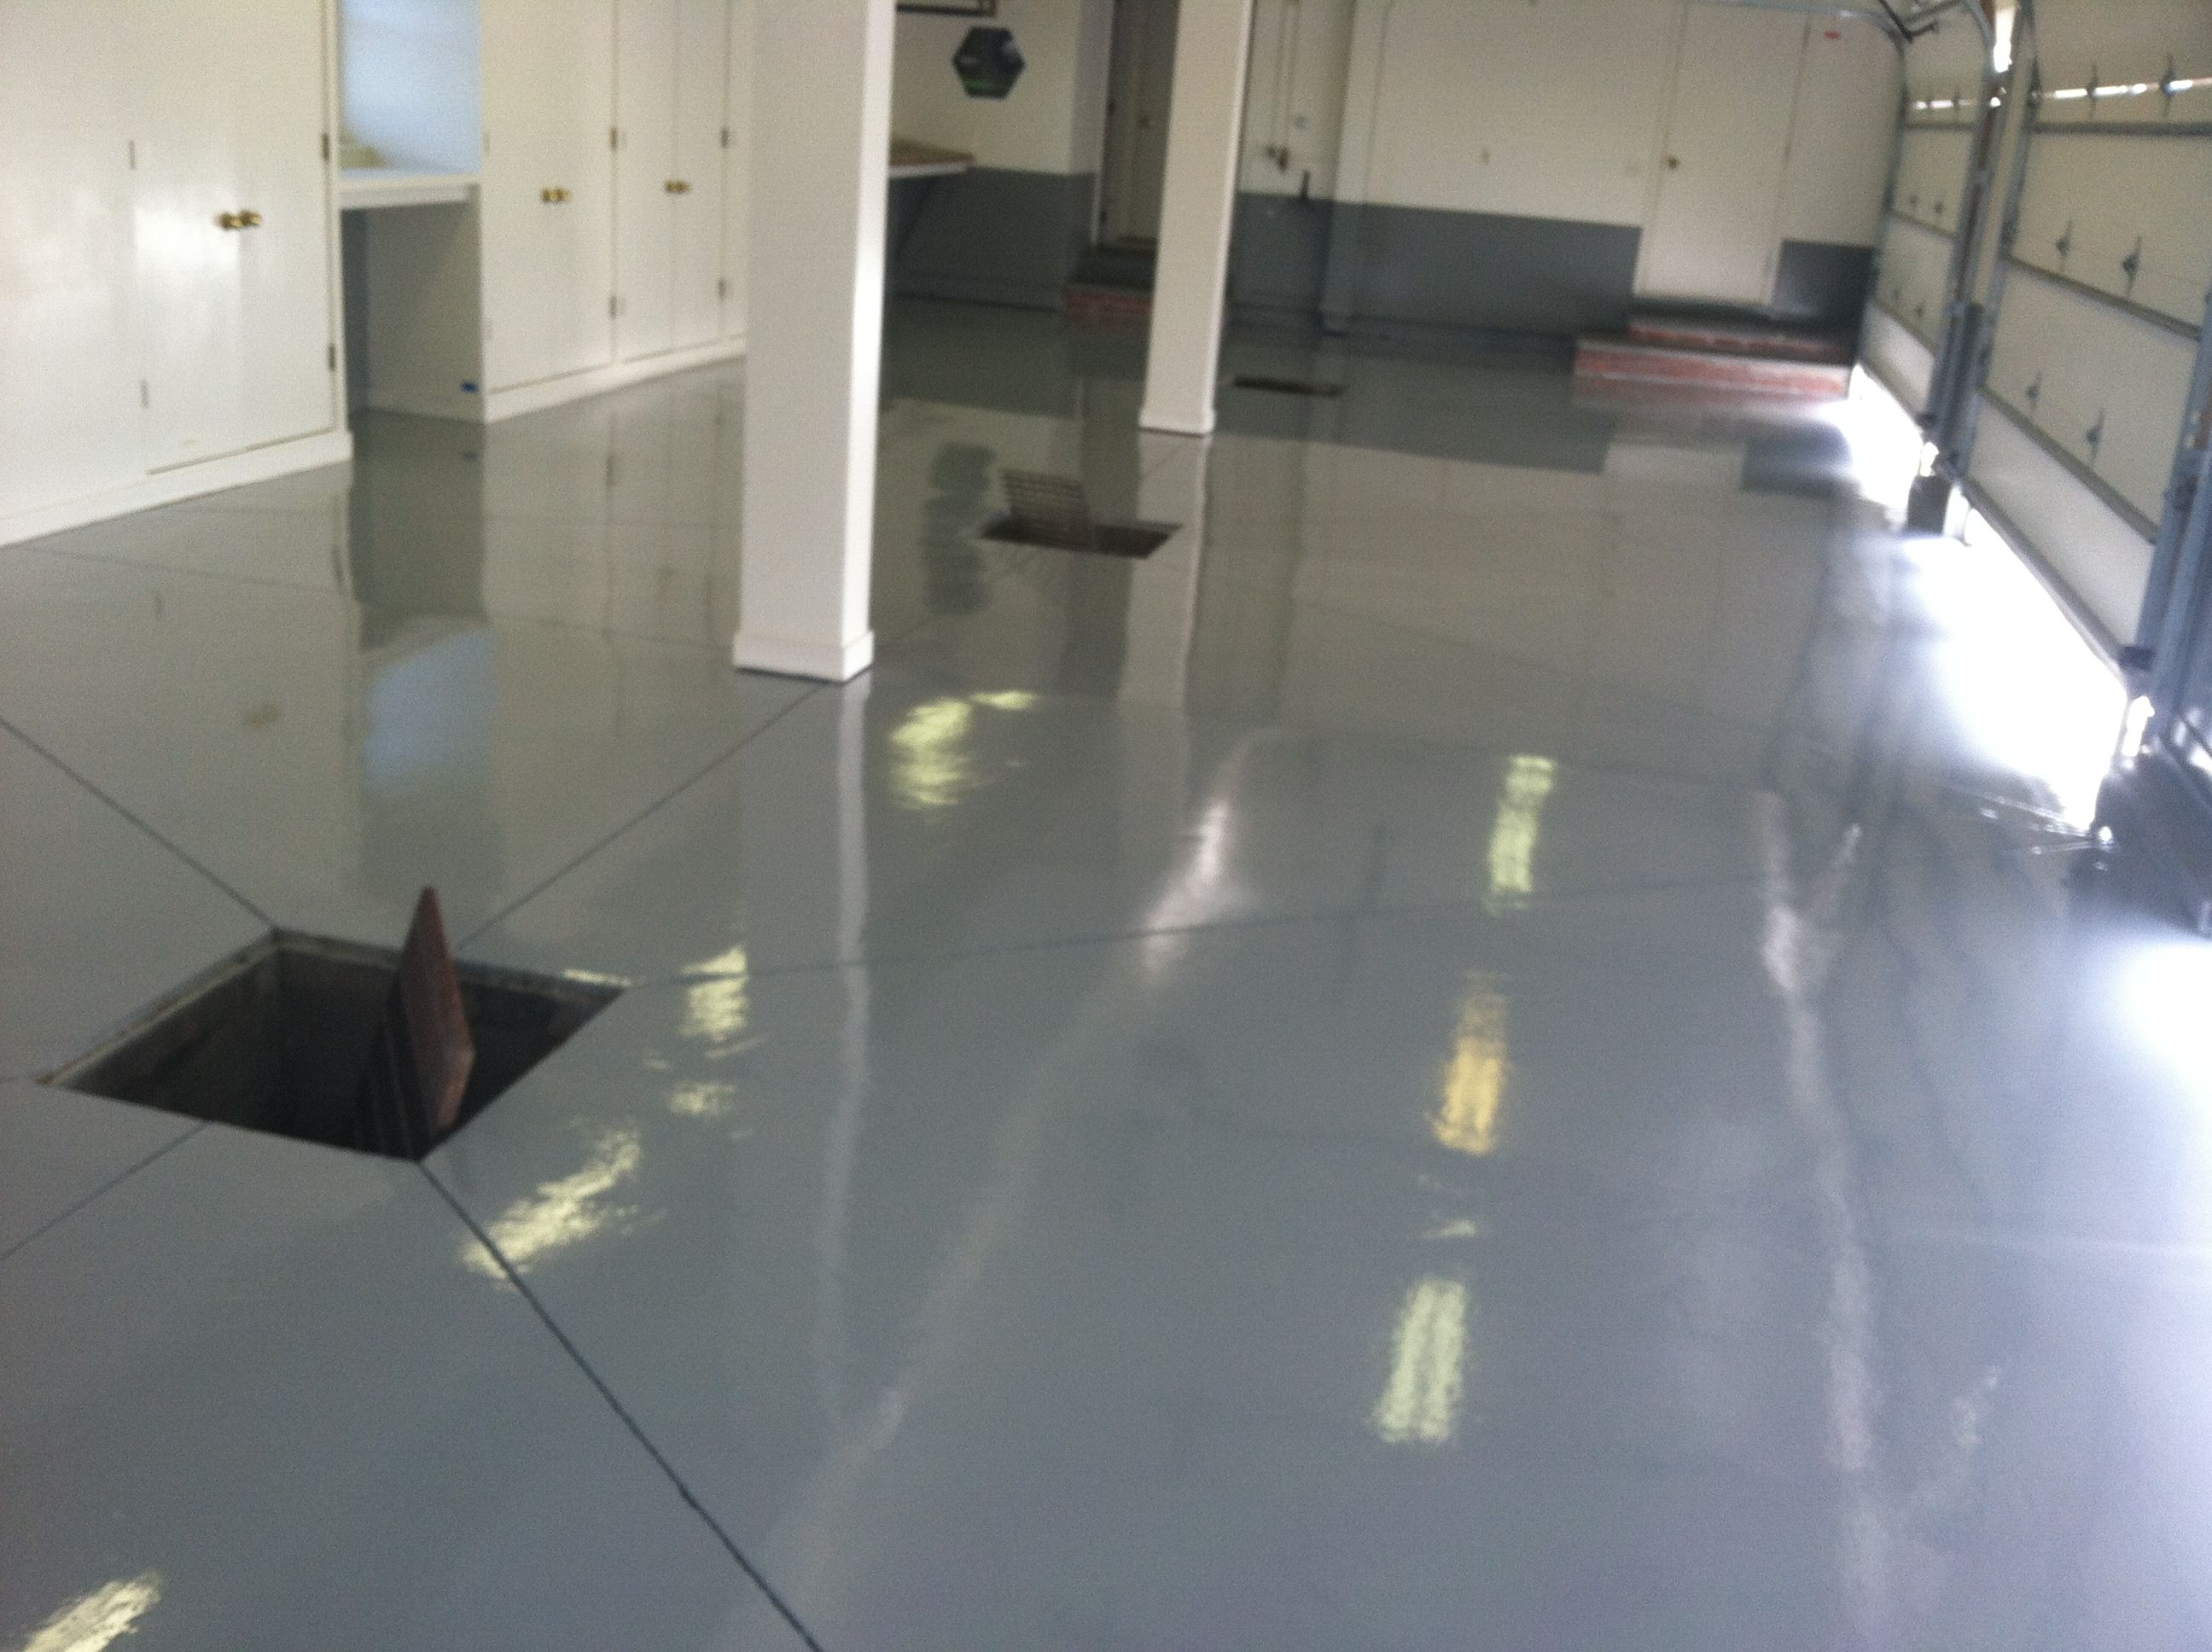 Epoxy Floors Ct Ep Floors Is A Single Source Installer Of Epoxy Floors Ct Specializes In Industrial Seamless Ep Flooring Contractor Flooring Epoxy Floor